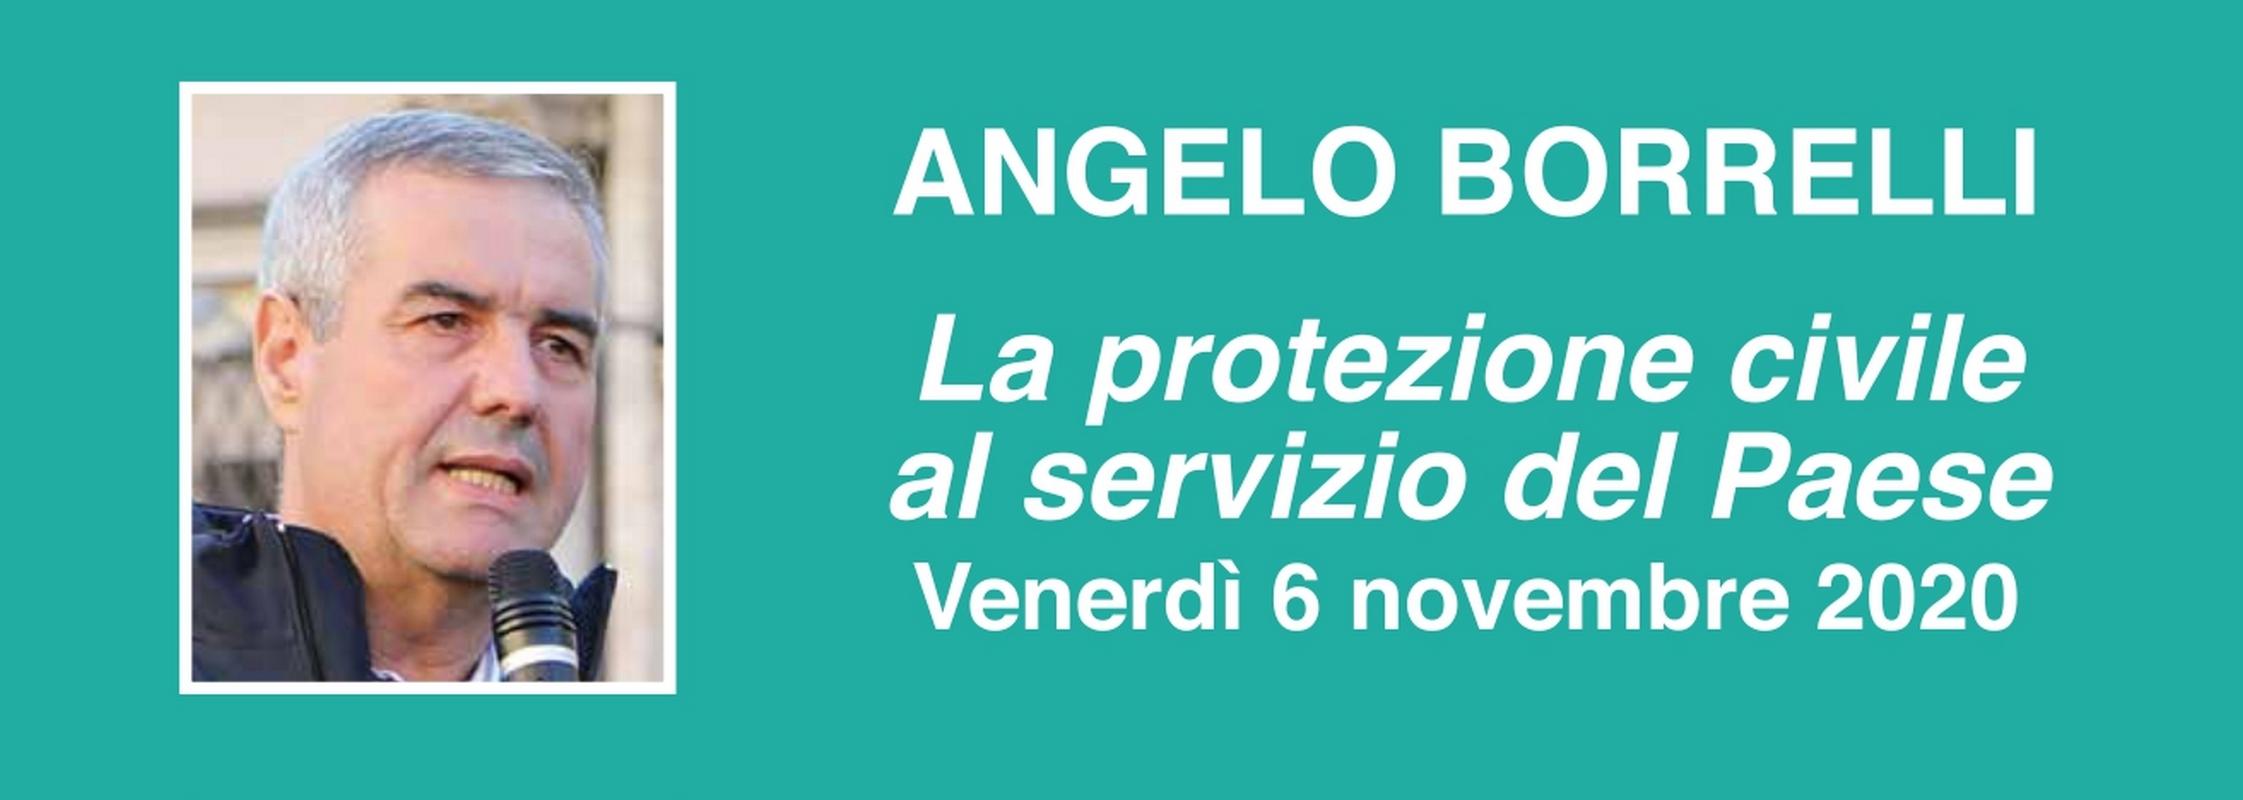 UVSPL 2020 – Angelo Borrelli